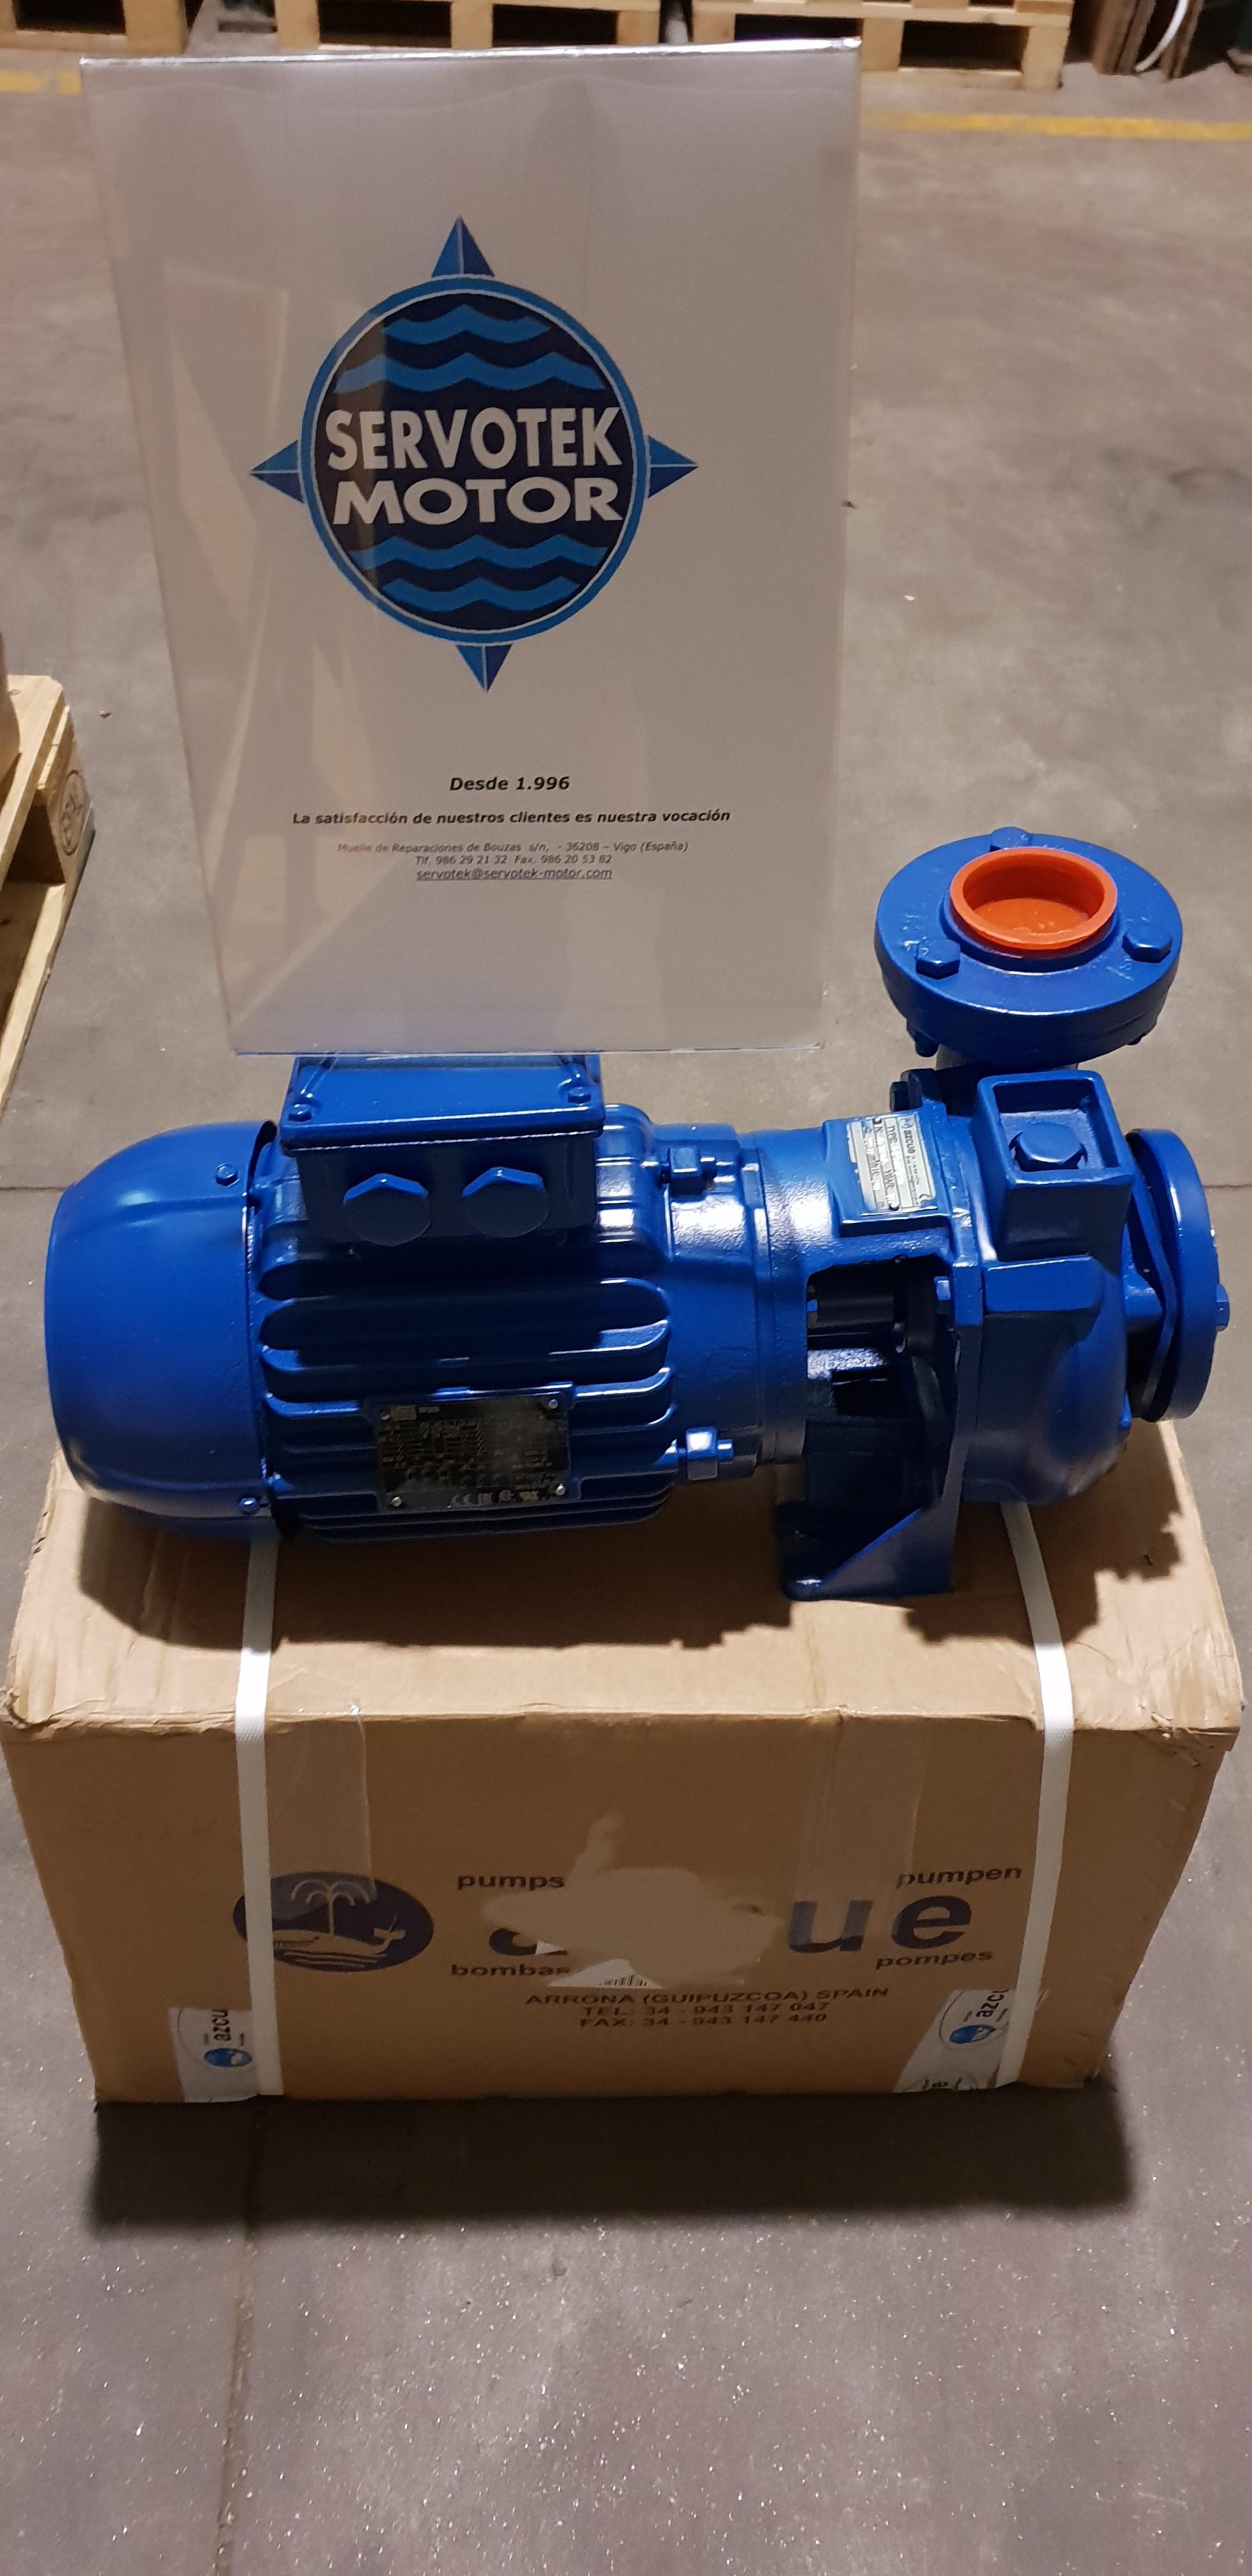 Catalog | Servotek Motor